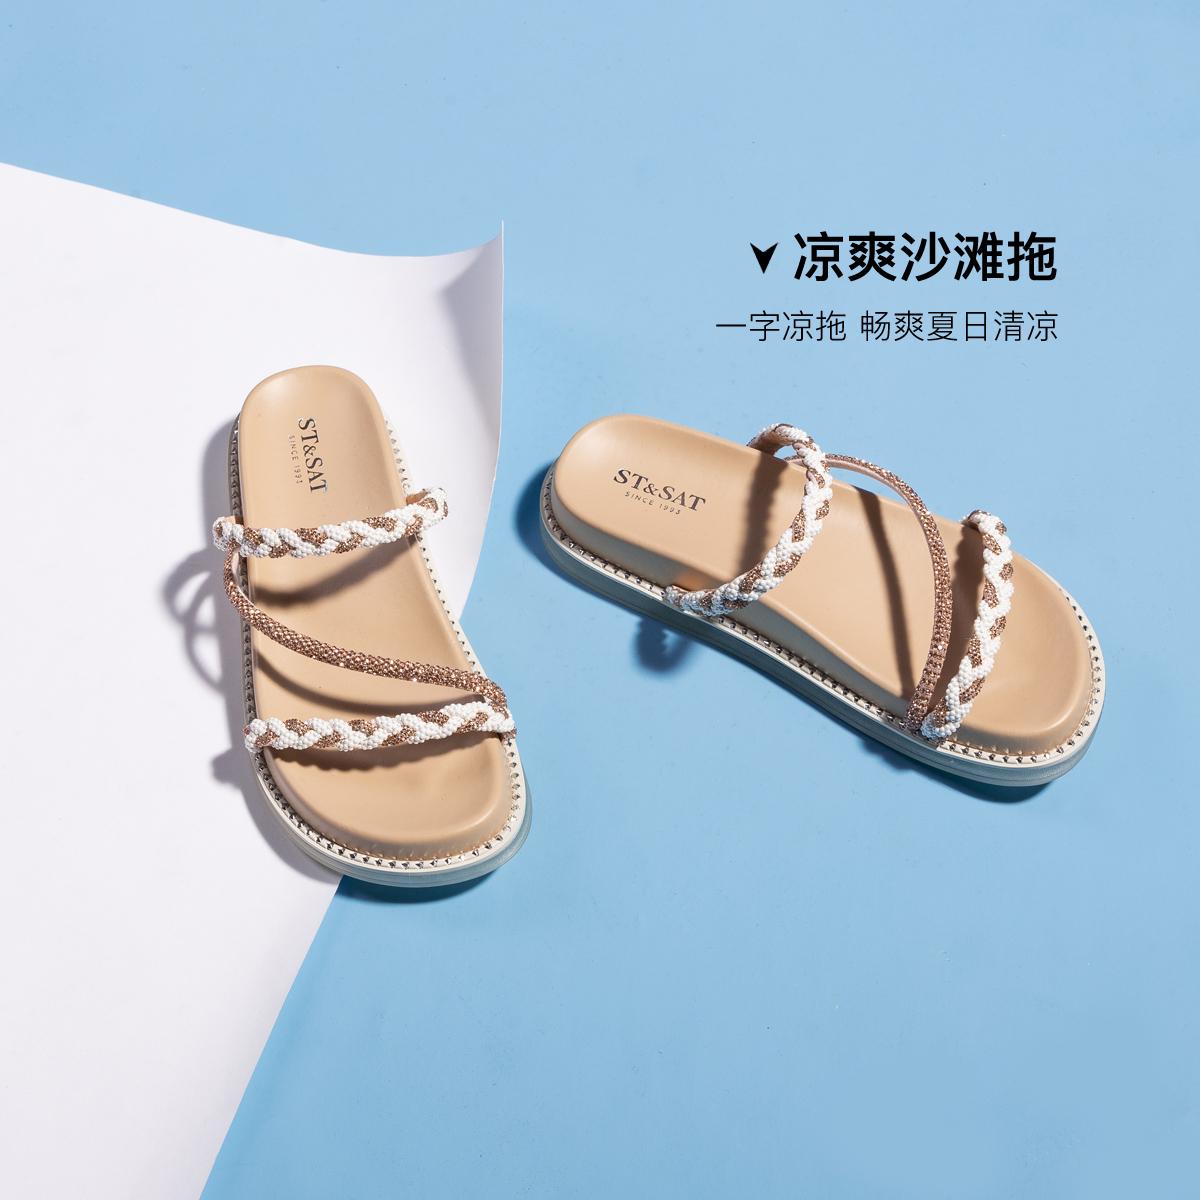 SS12110527 夏季新款一字拖厚底懒人鞋 2021 星期六女士凉拖